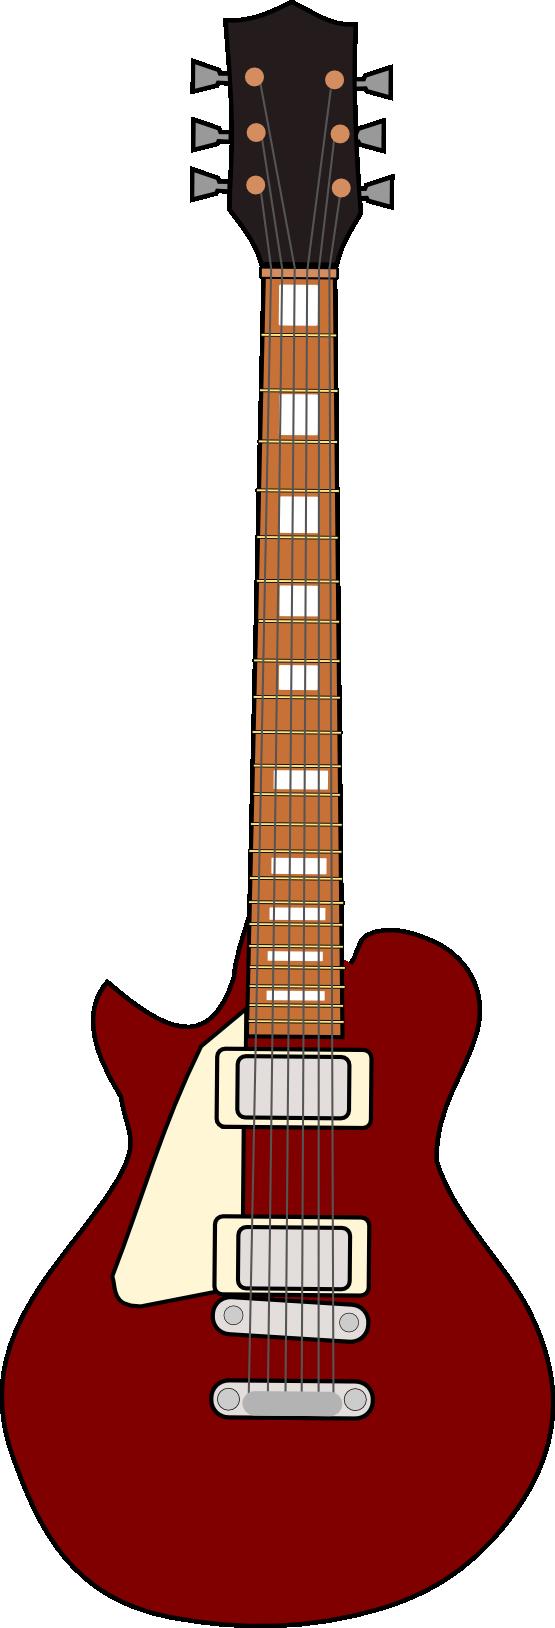 Clipart guitar 80 guitar. Broken cliparthot of music